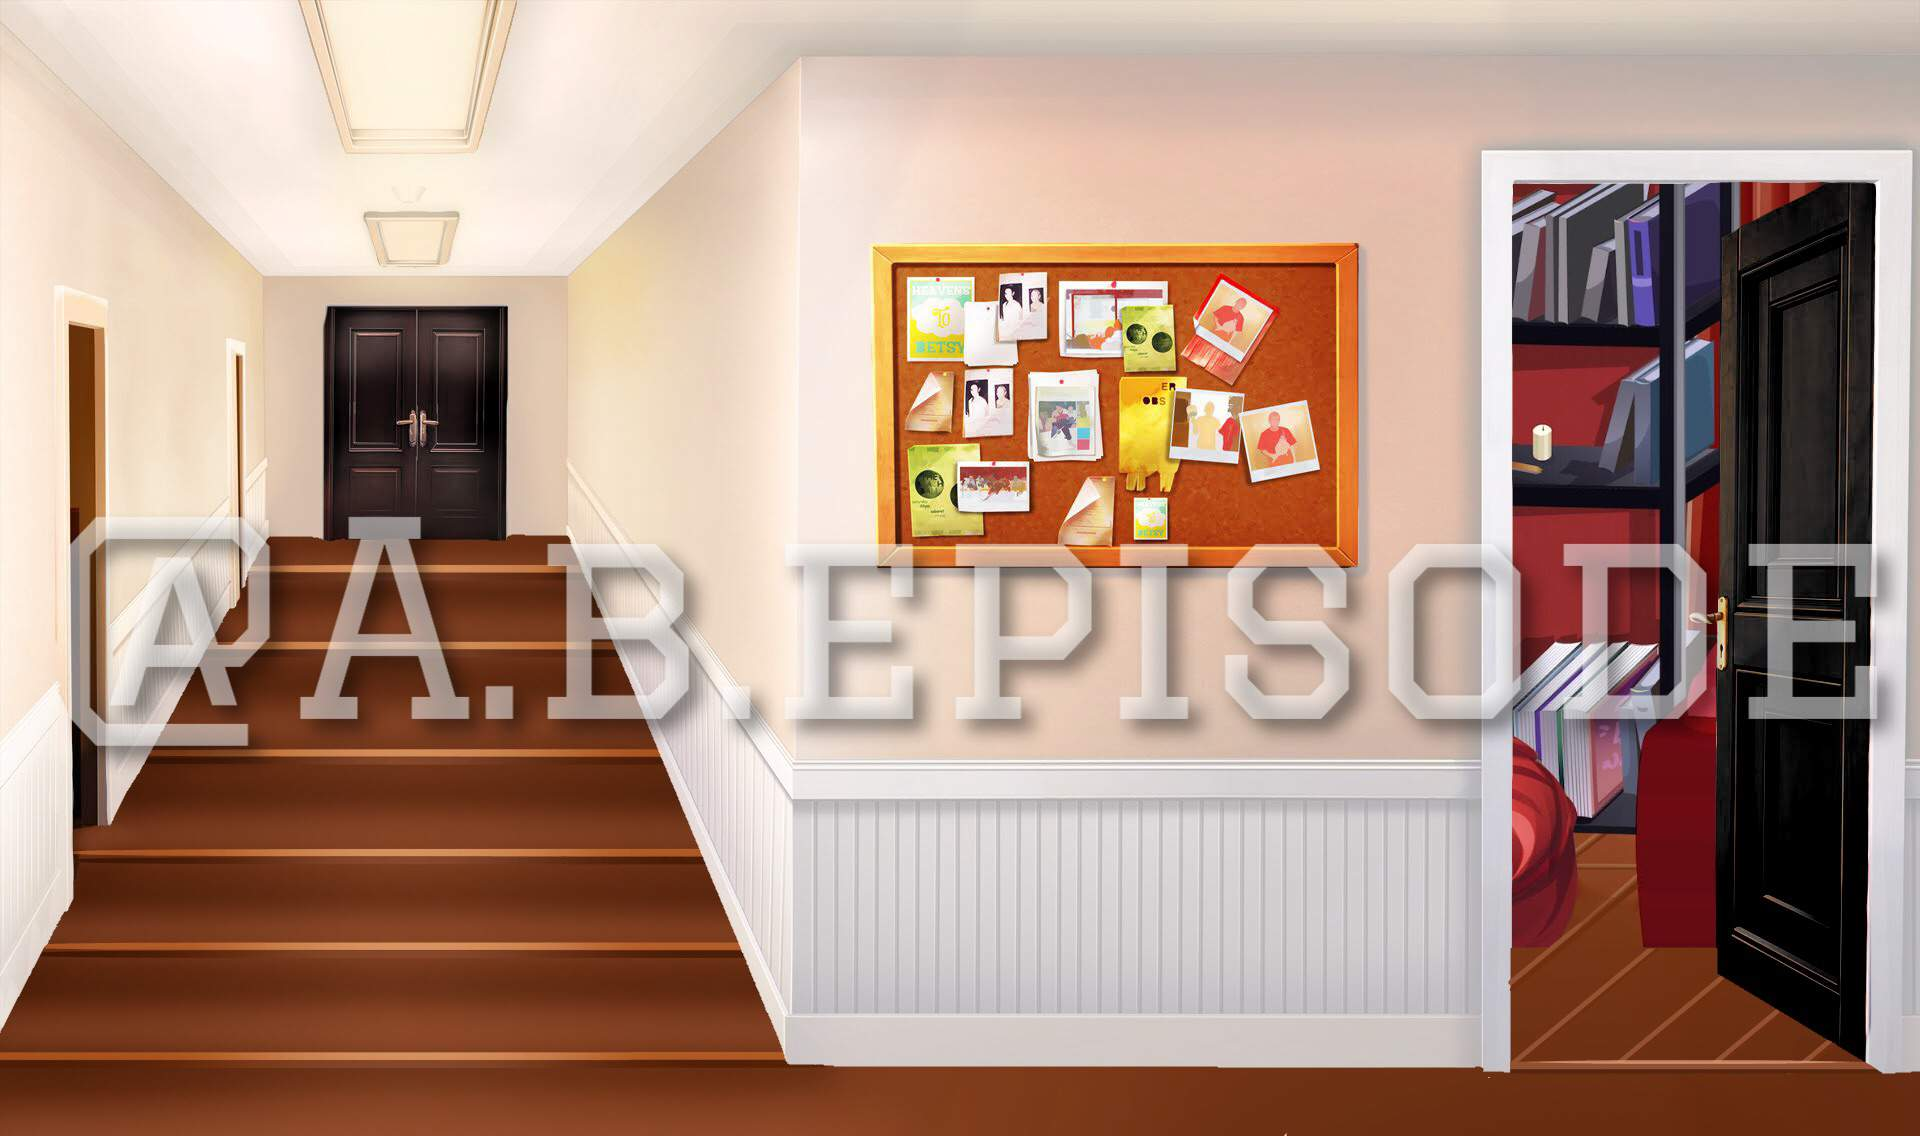 Hallway Background Edits Episode Choose Your Story Amino